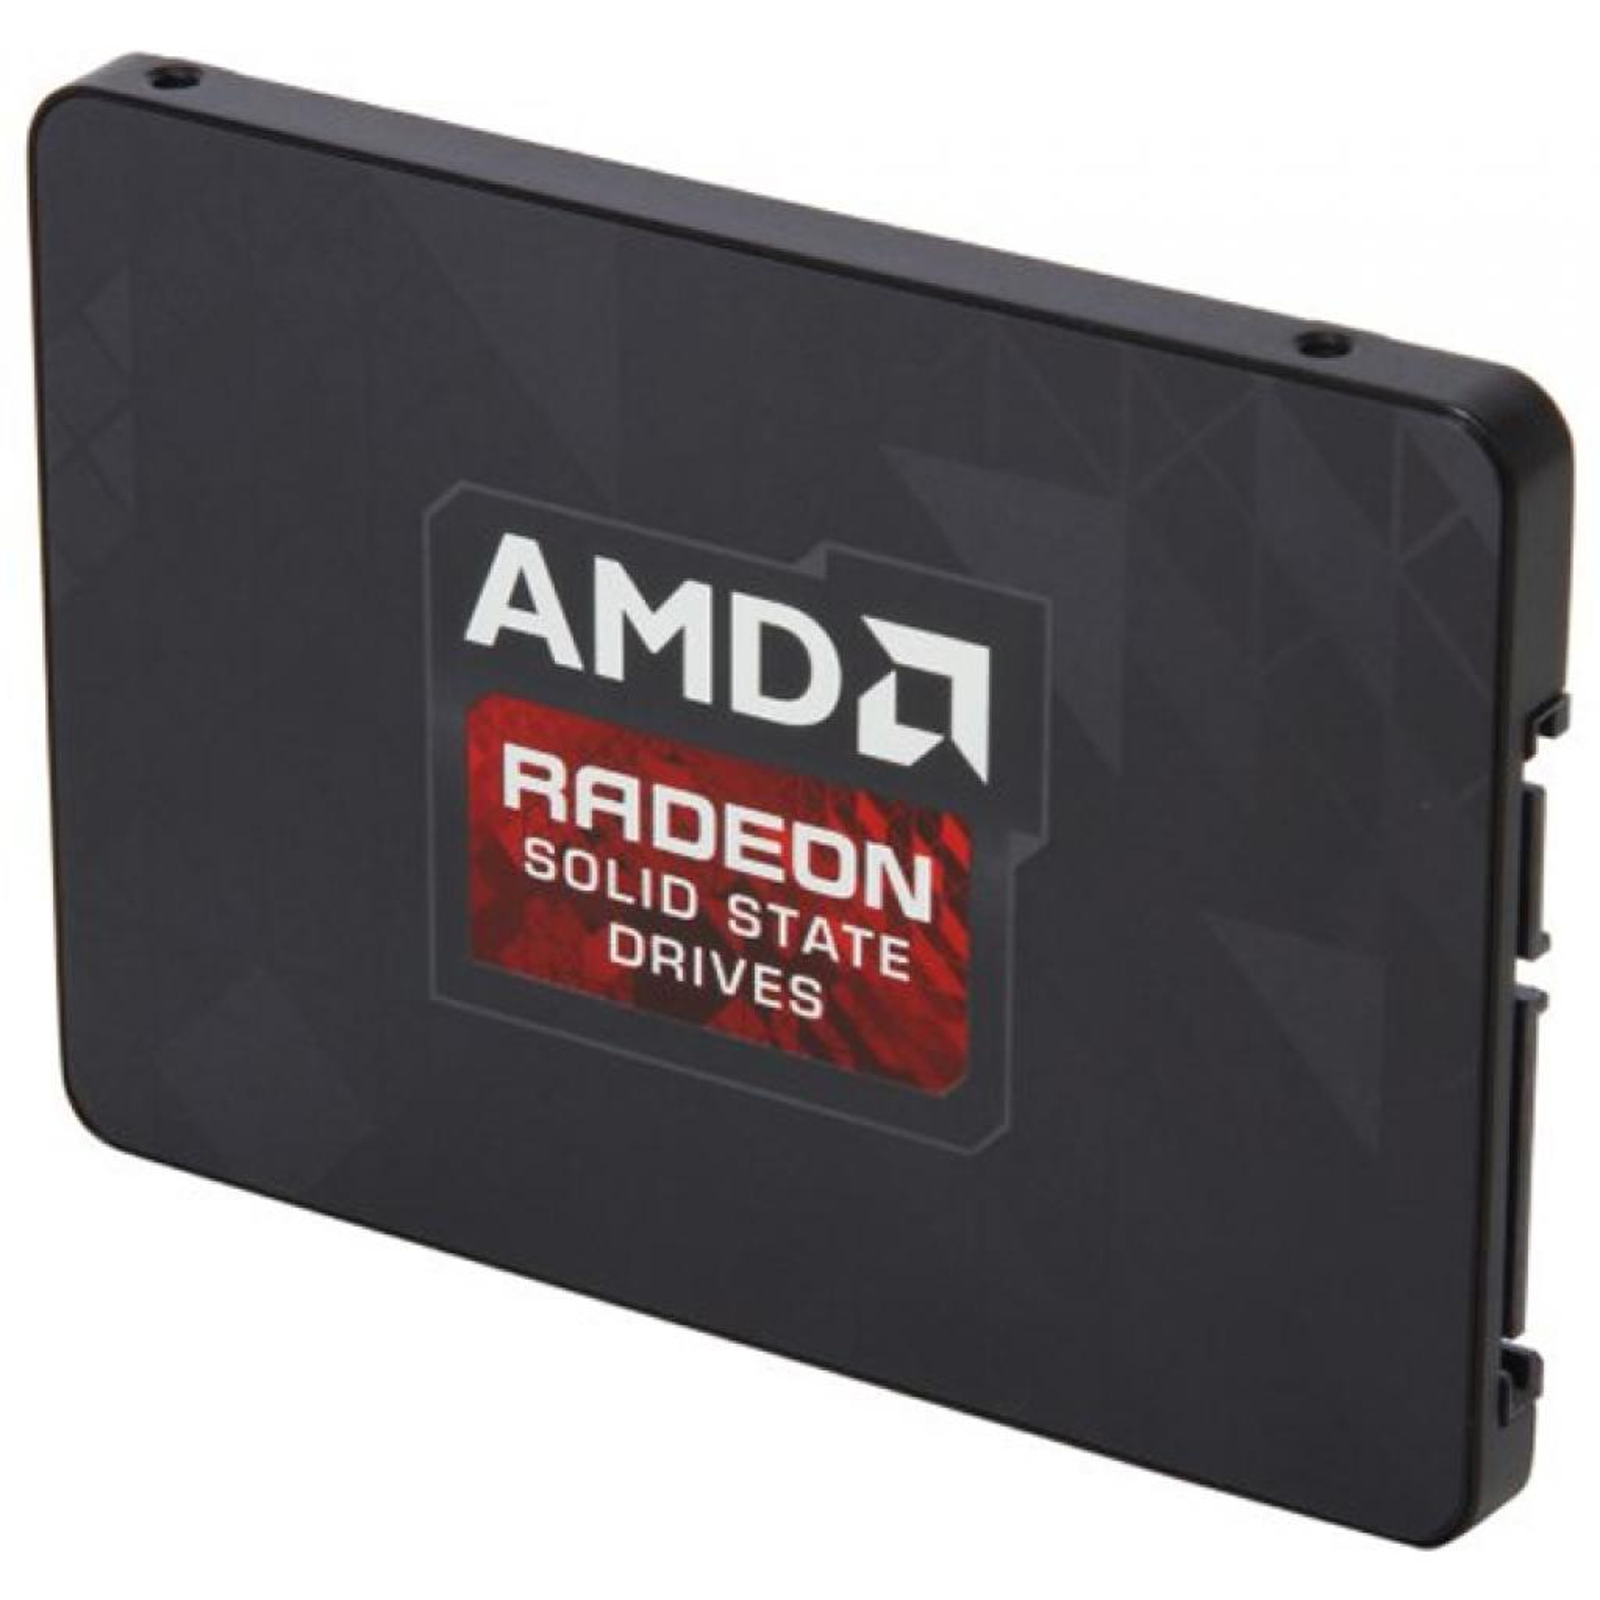 "Накопитель SSD 2.5"" 480GB AMD (R3SL480G) изображение 2"